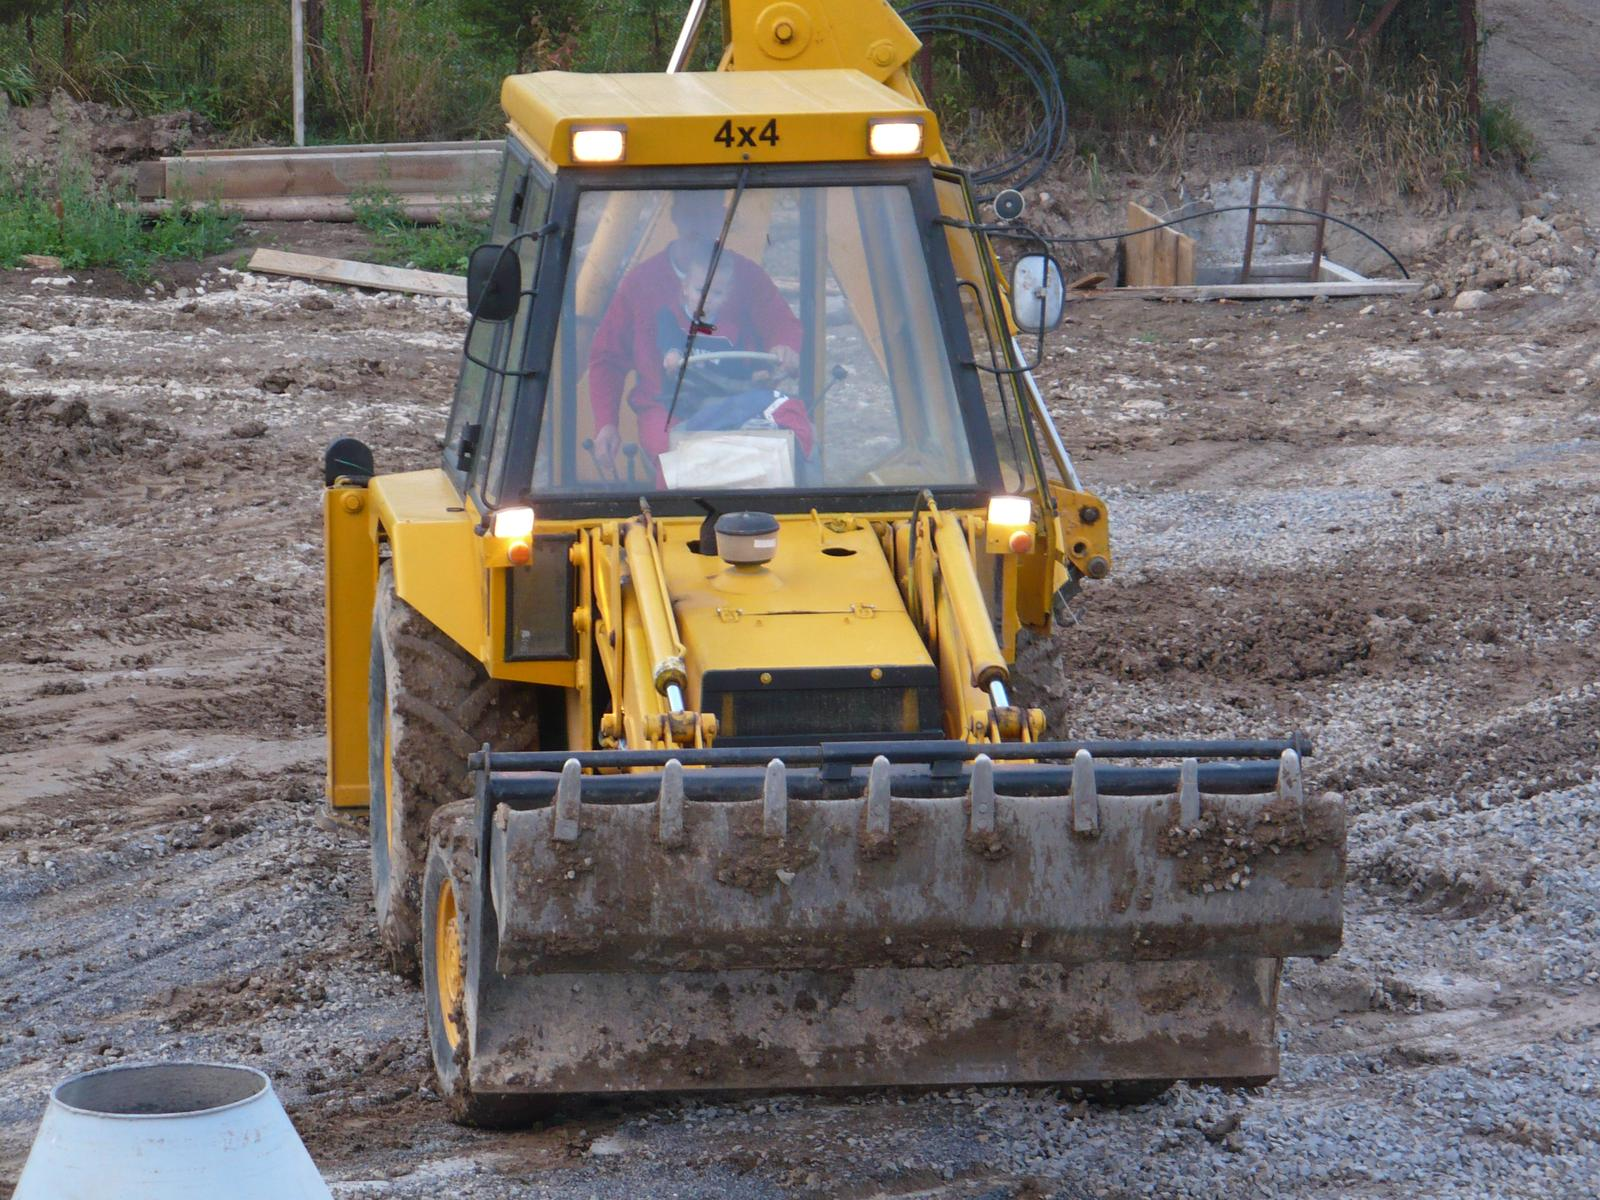 Pasívny dom svojpomocne - Na taketo terenne upravy sa oplatilo obstarat vlastny traktorbager